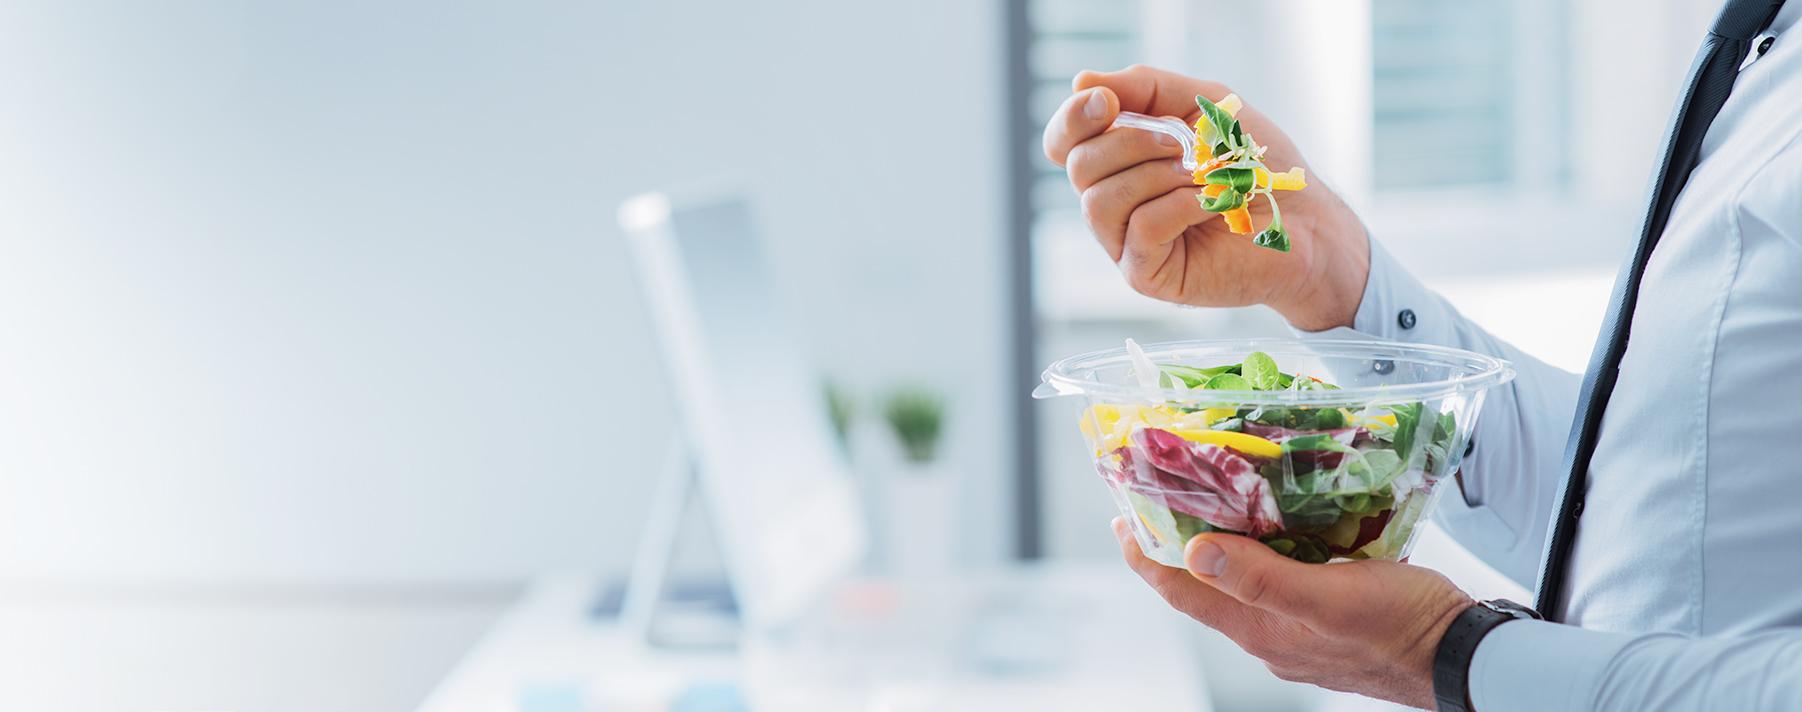 plato saludable segun harvard